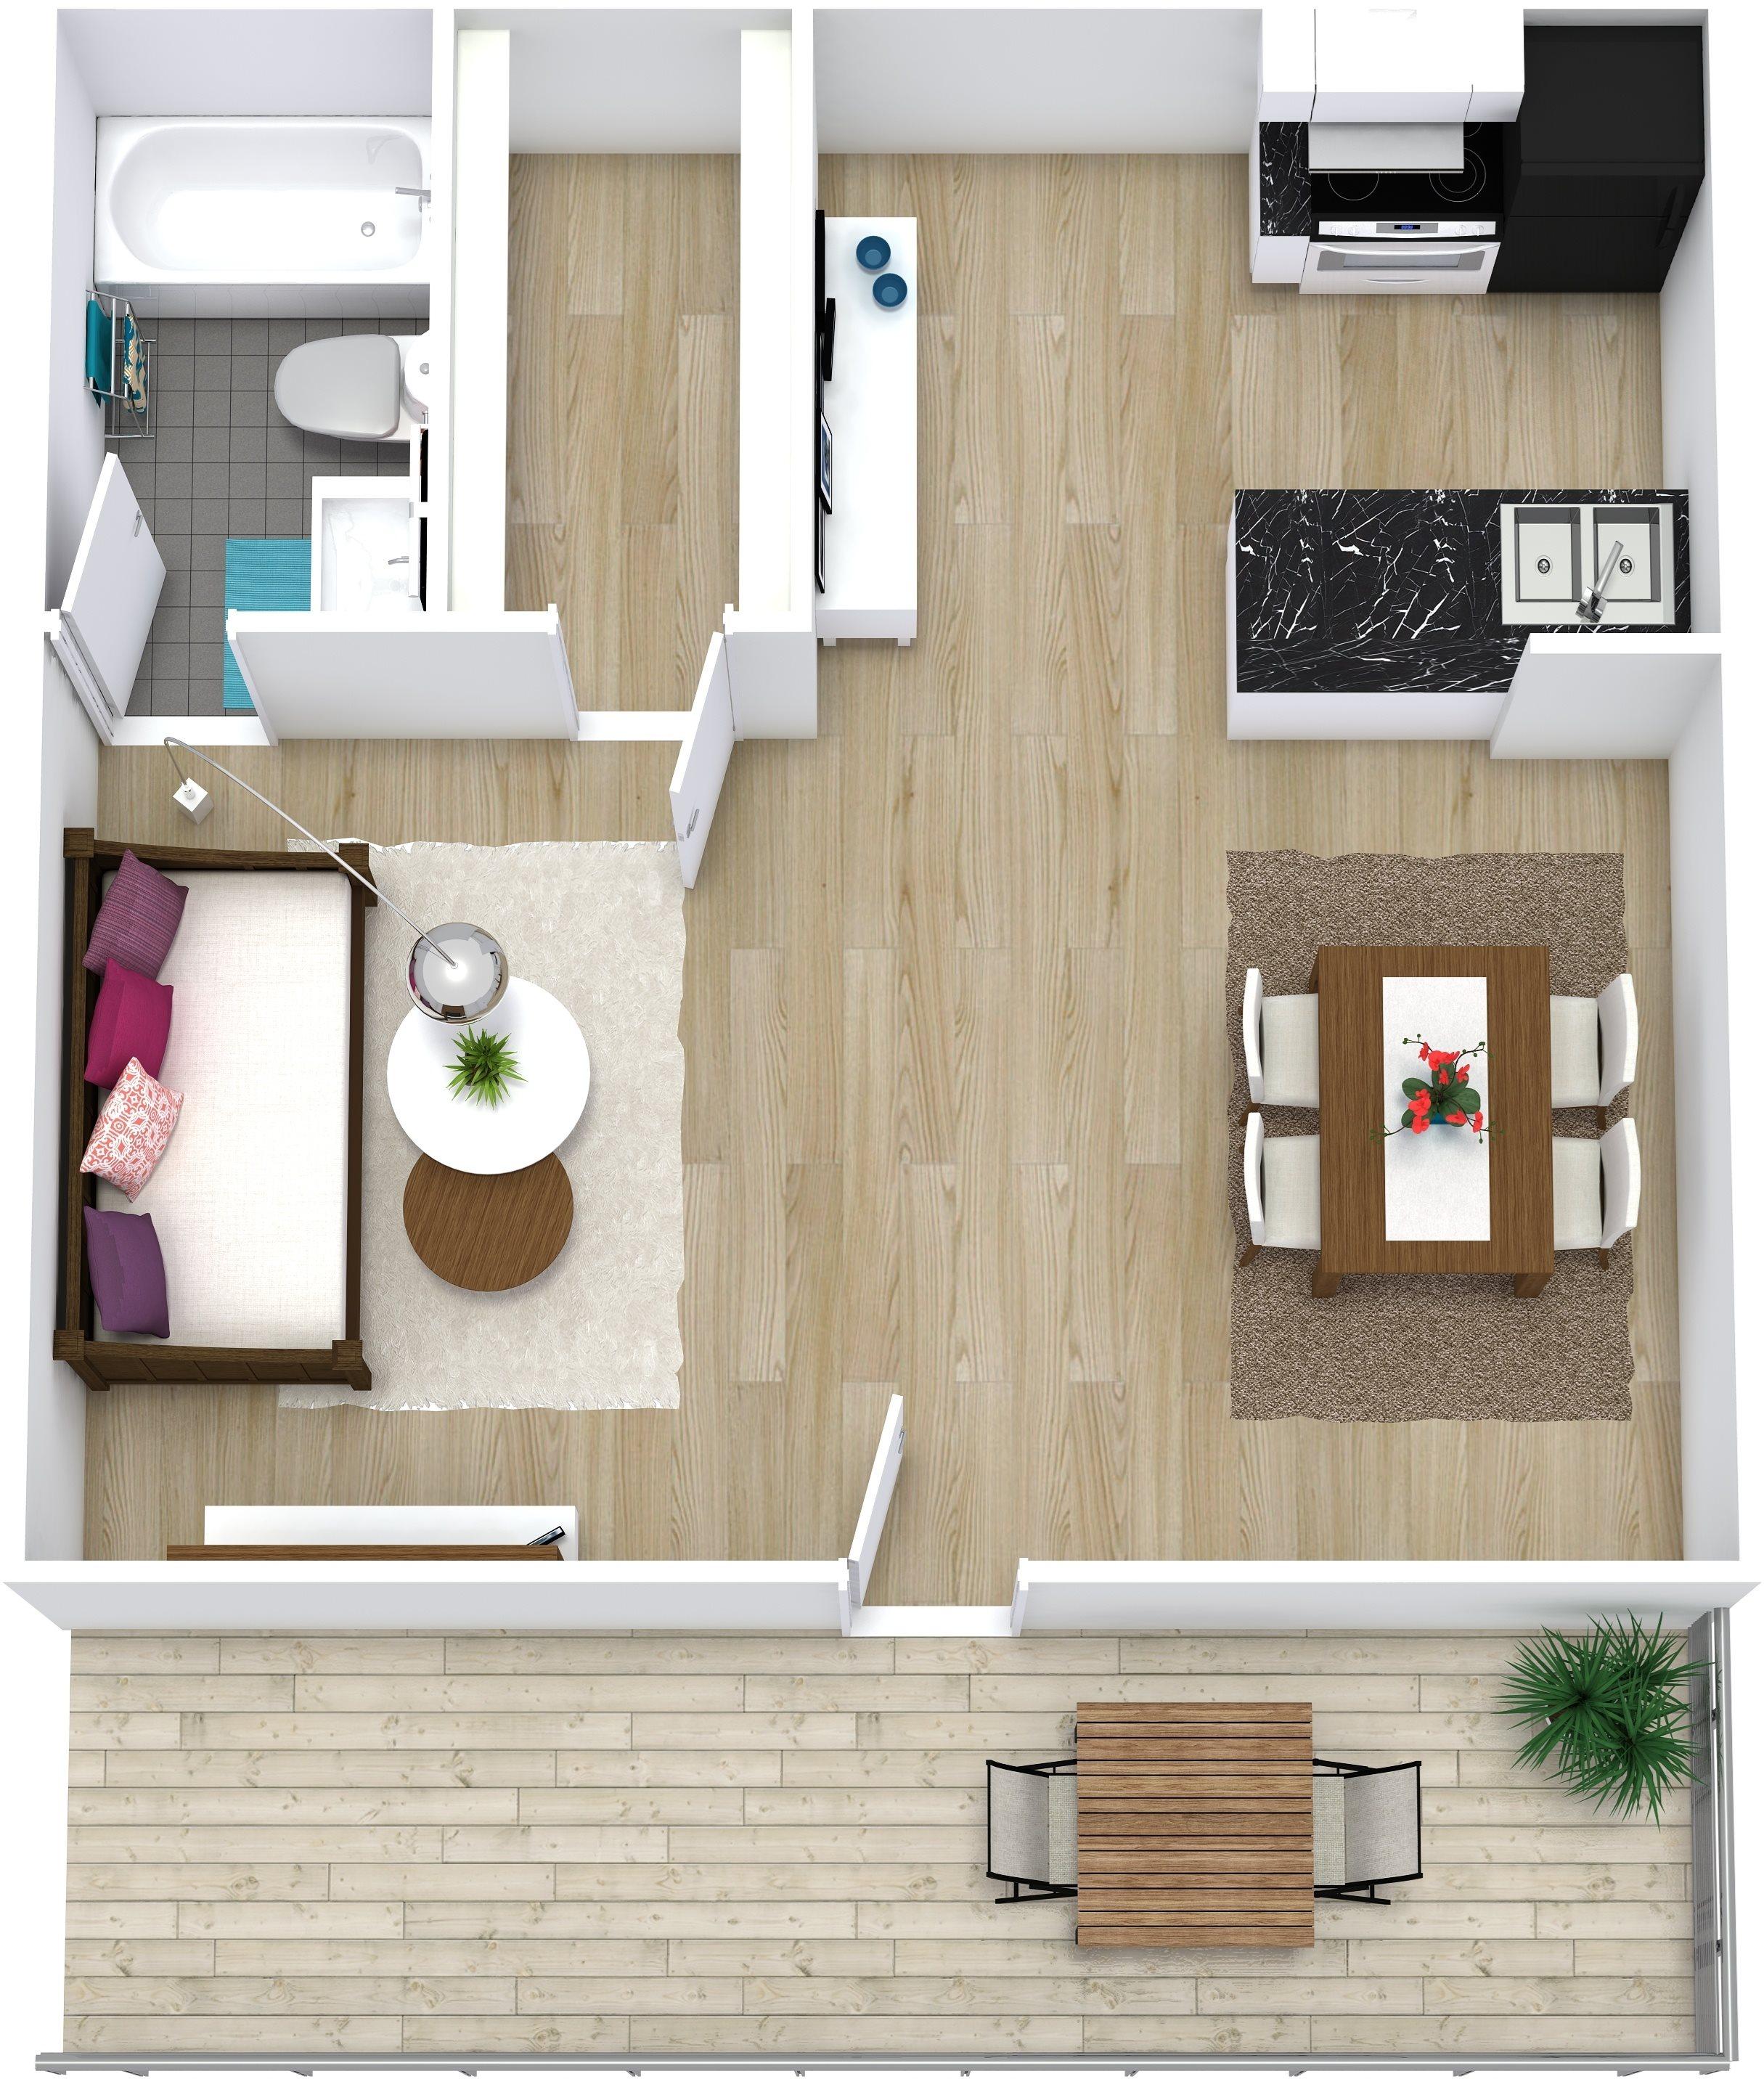 Emerald Palms Apartments: Tuscany Palms Apartments In Mesa, Arizona